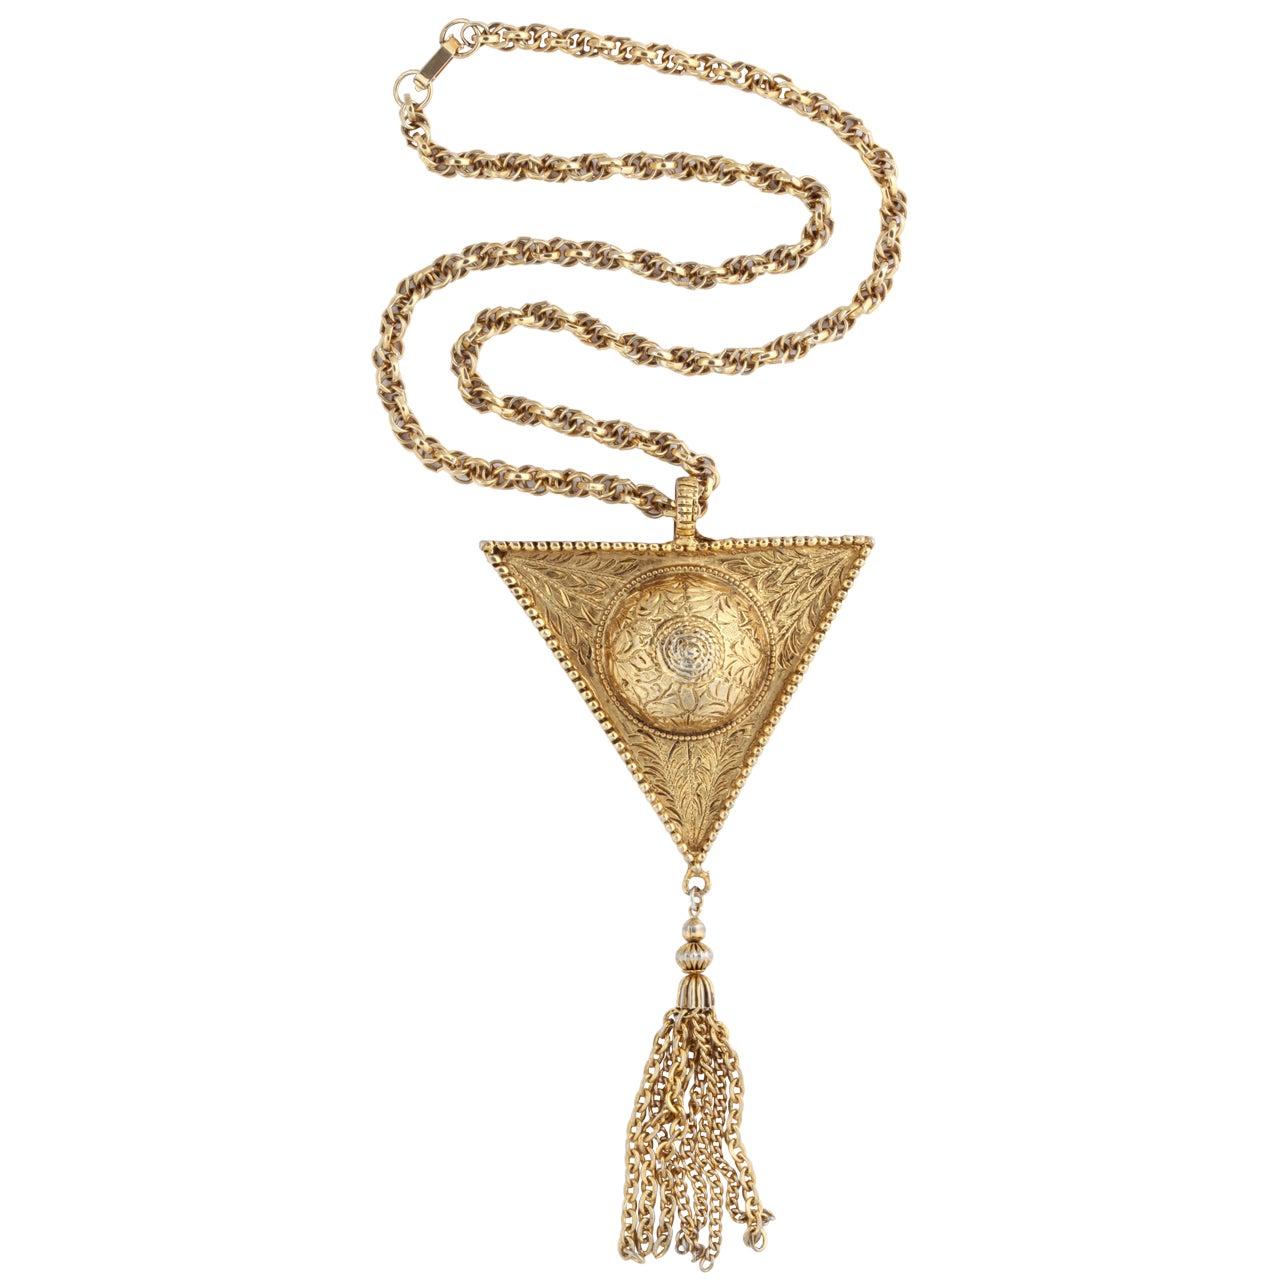 Triangular Medallion Pendant Necklace